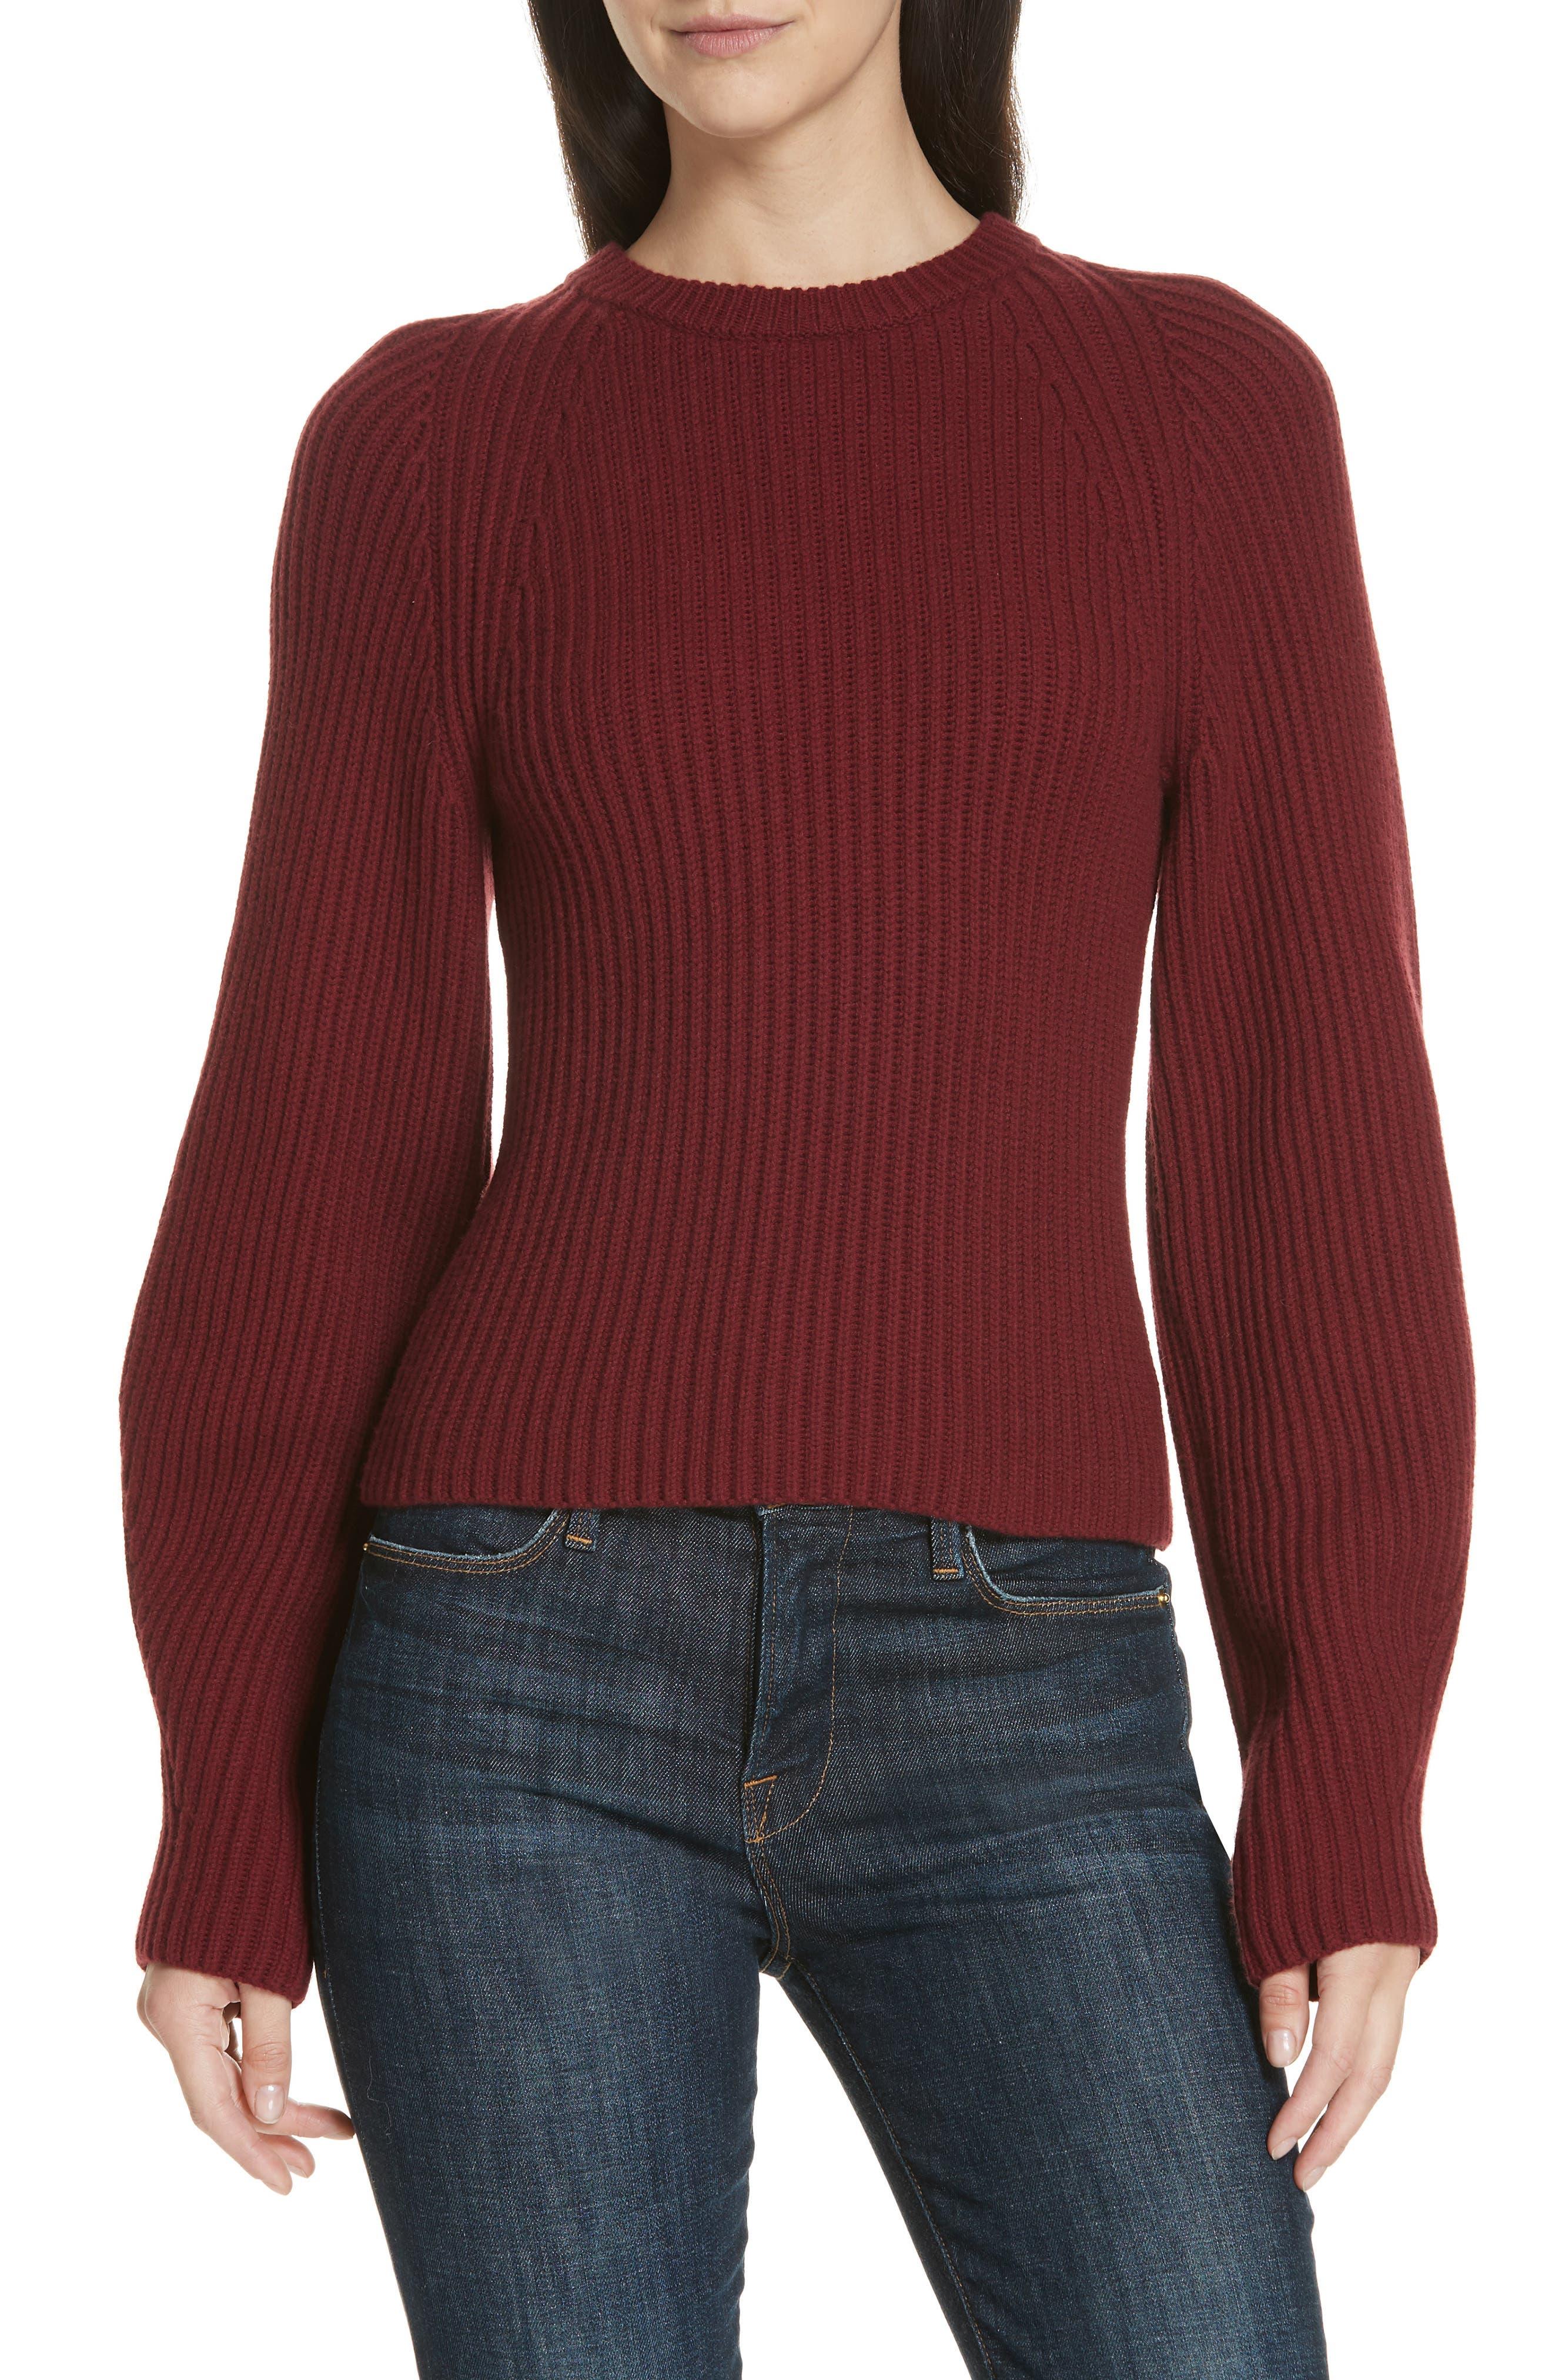 Theory Sculpted Sleeve Shaker Stitch Merino Wool Sweater, Burgundy